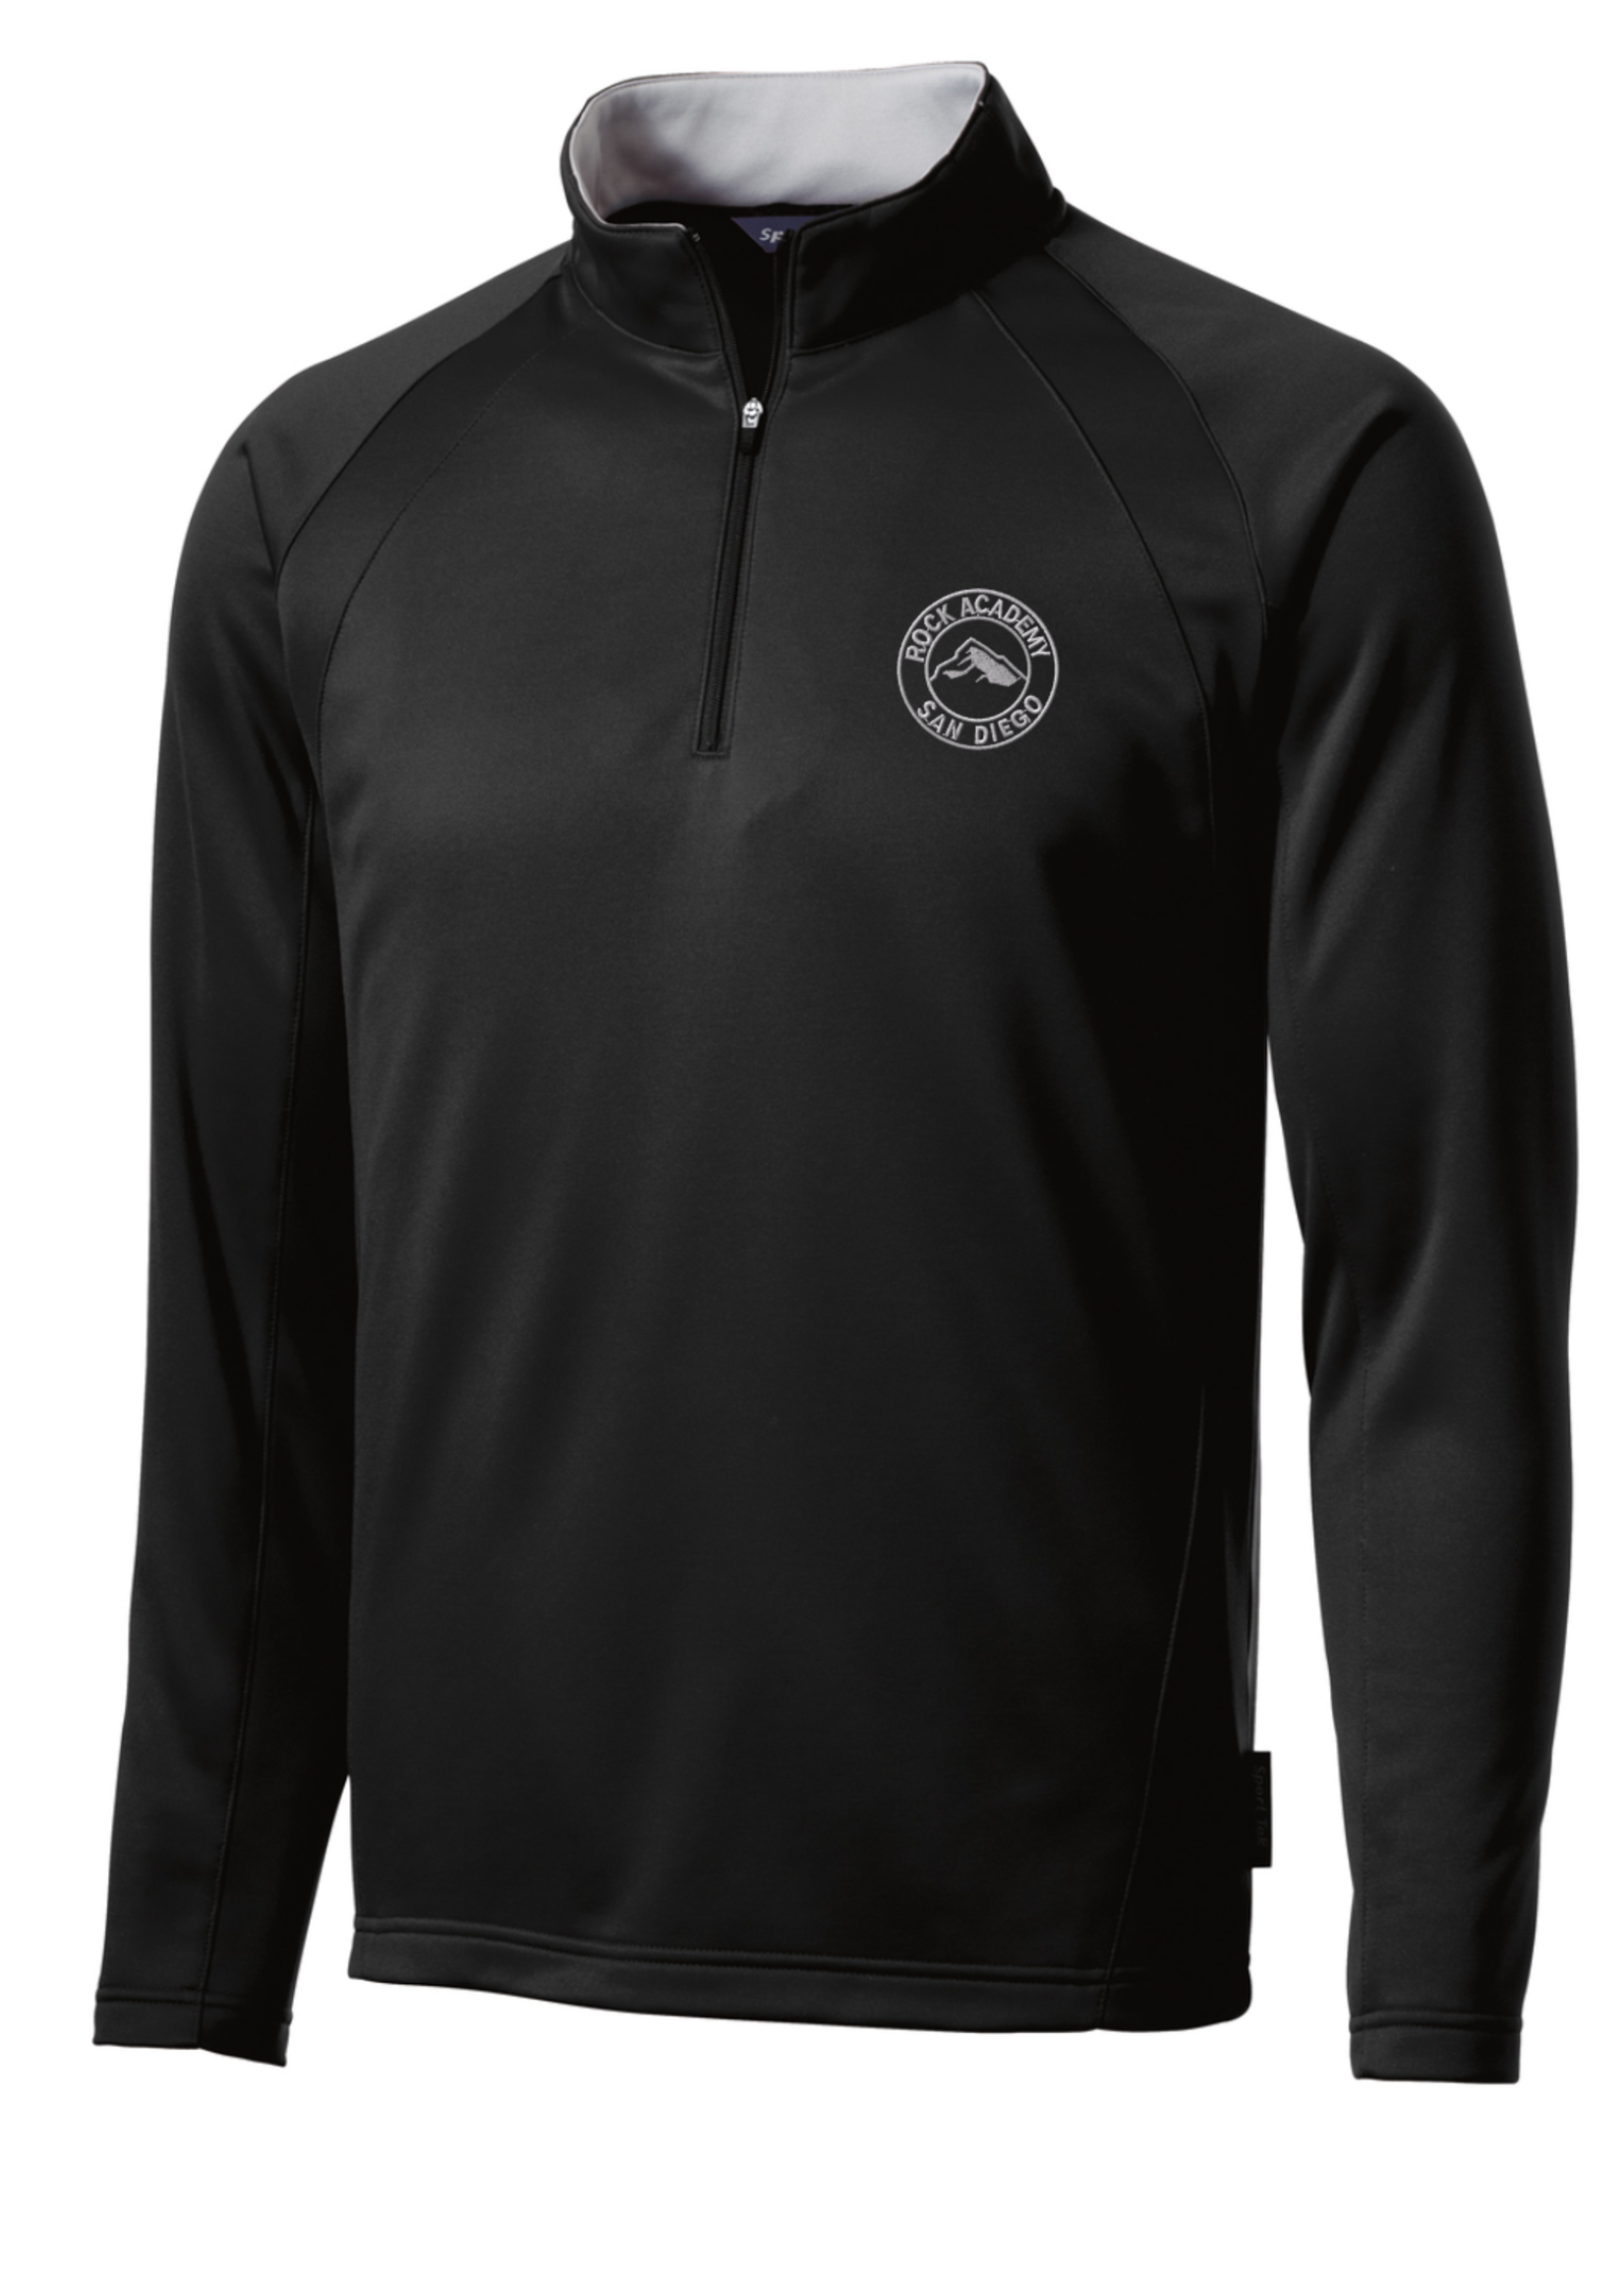 TUS ROCK Black 1/4 Zip Performance Jacket